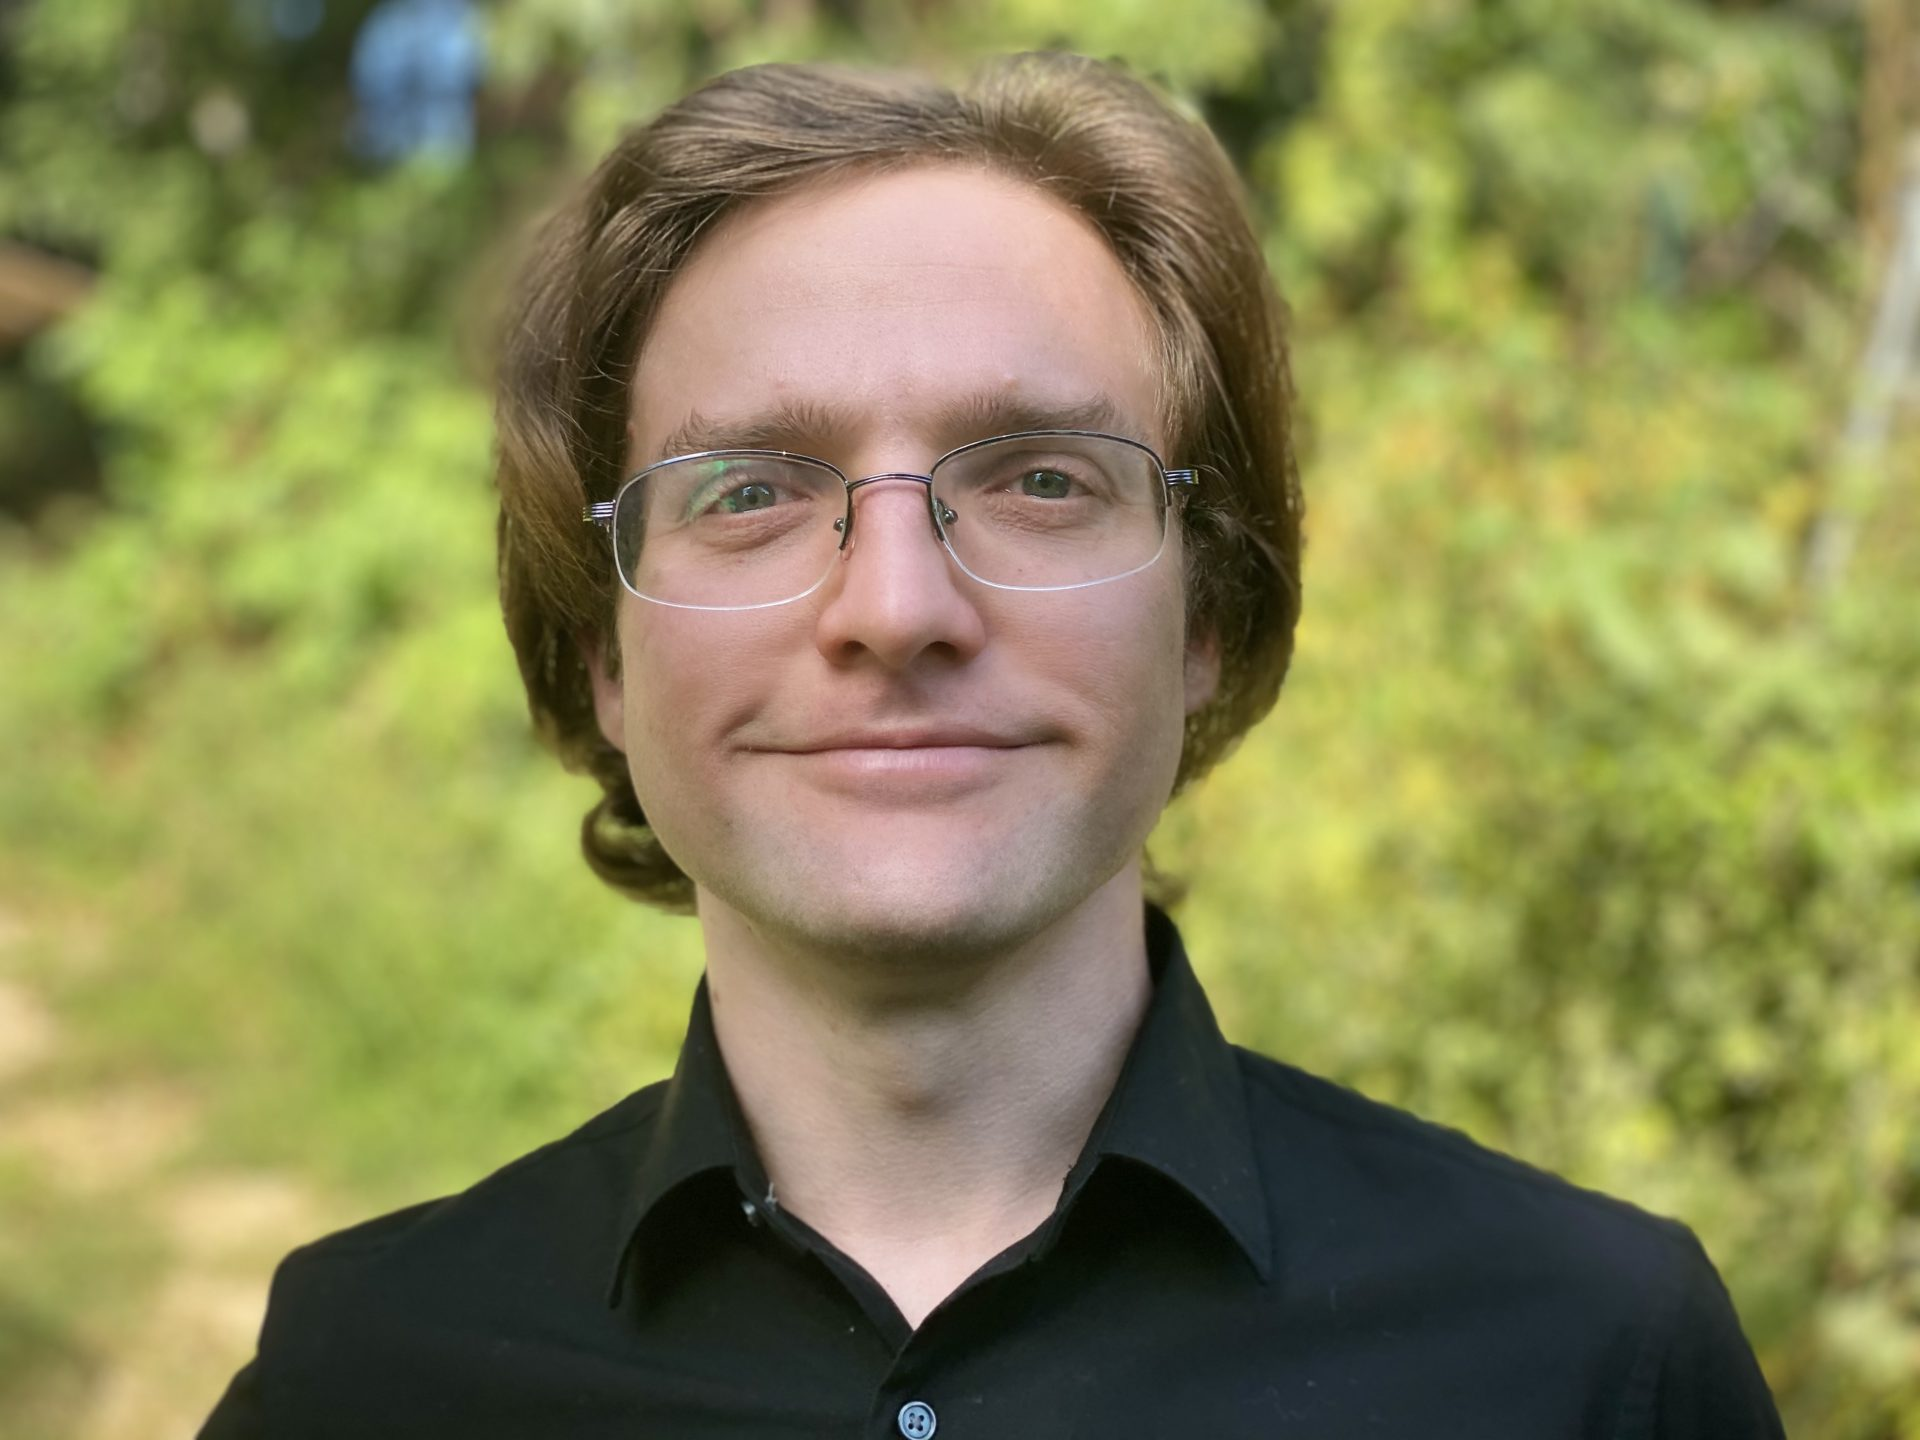 Trent Kinnucan